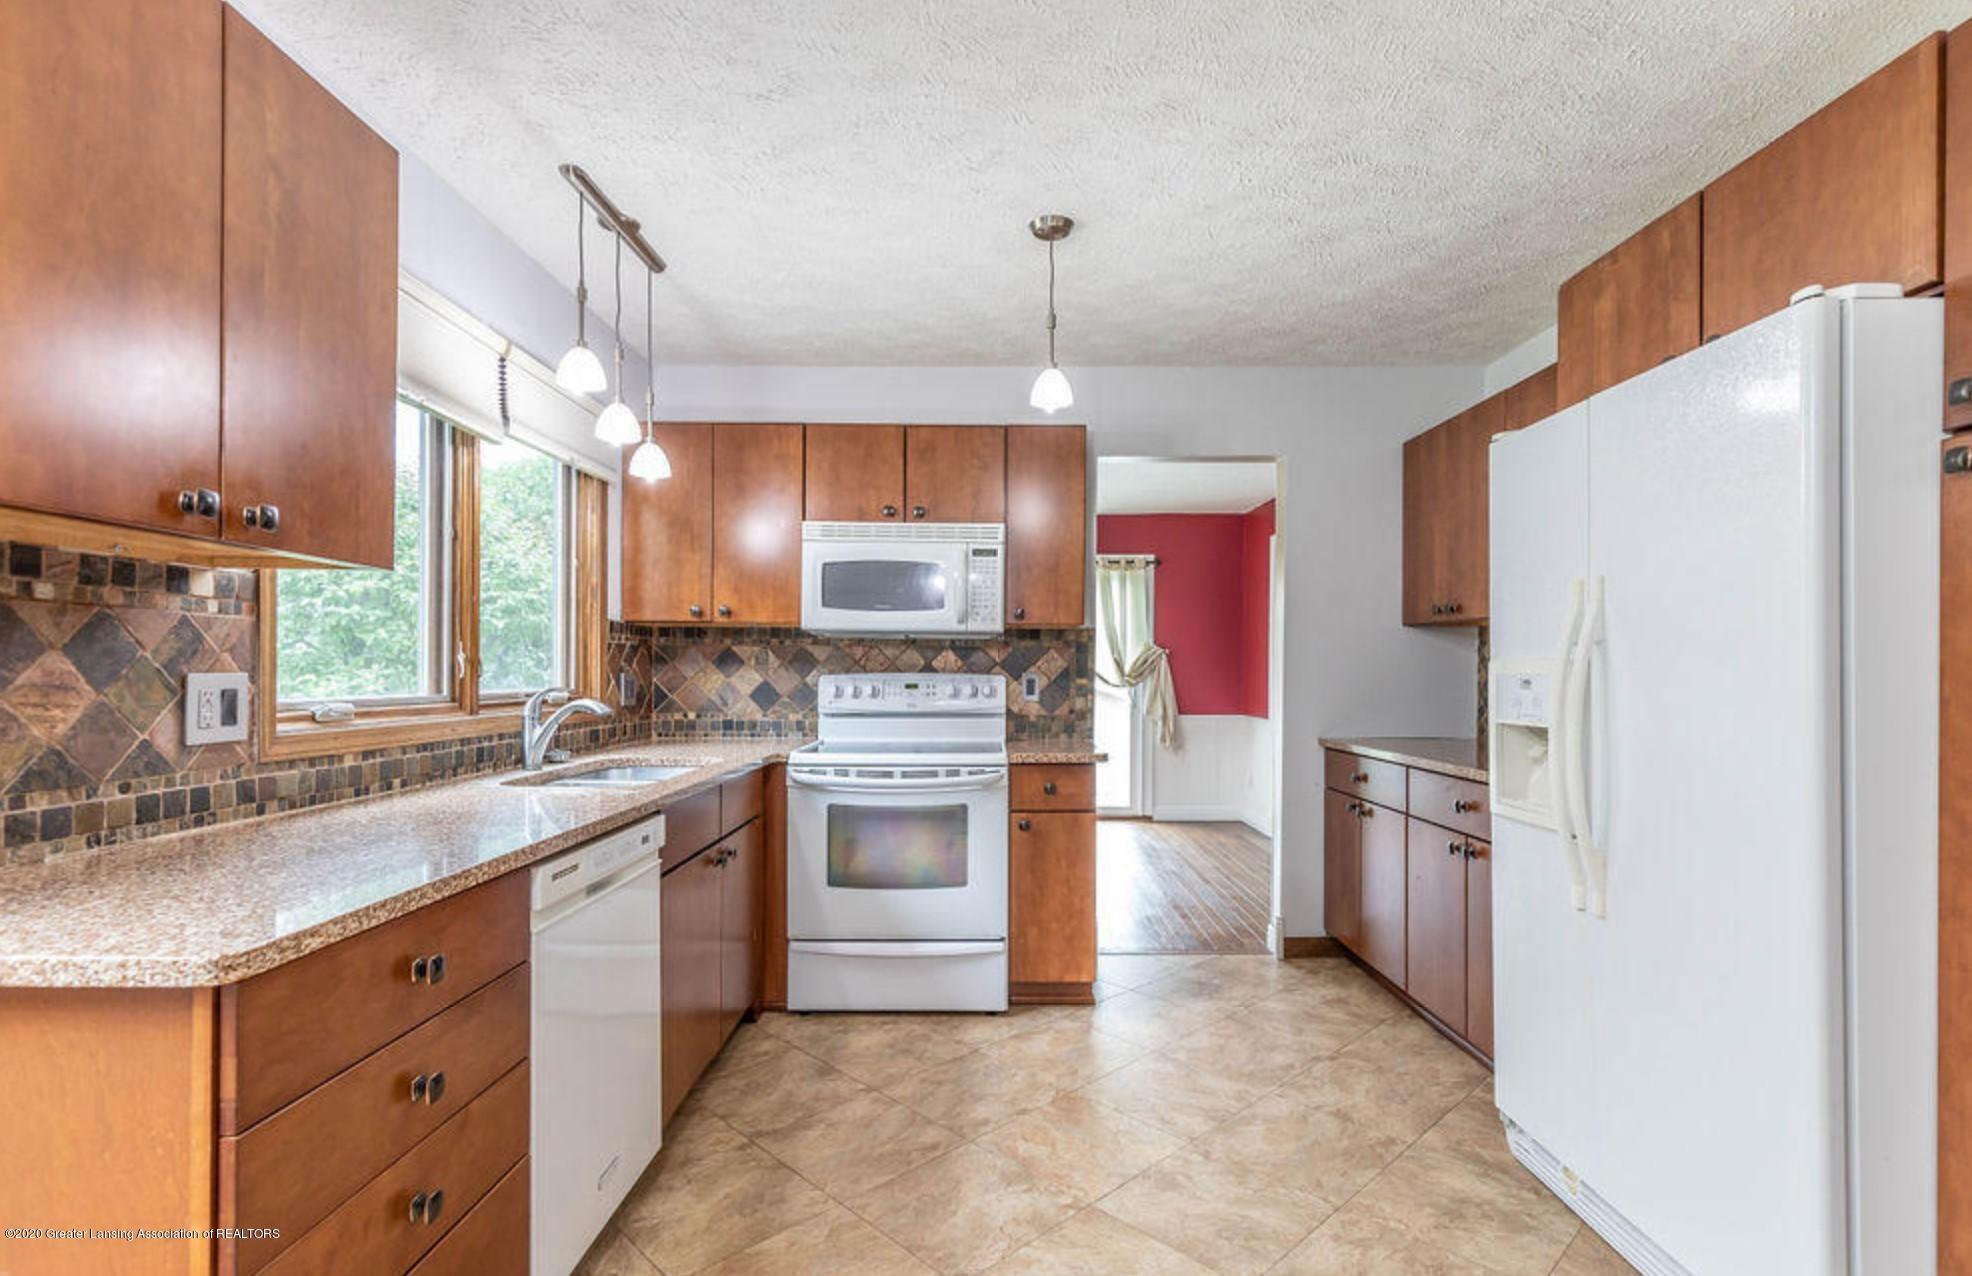 4215 Whitby Ln - Kitchen - 10